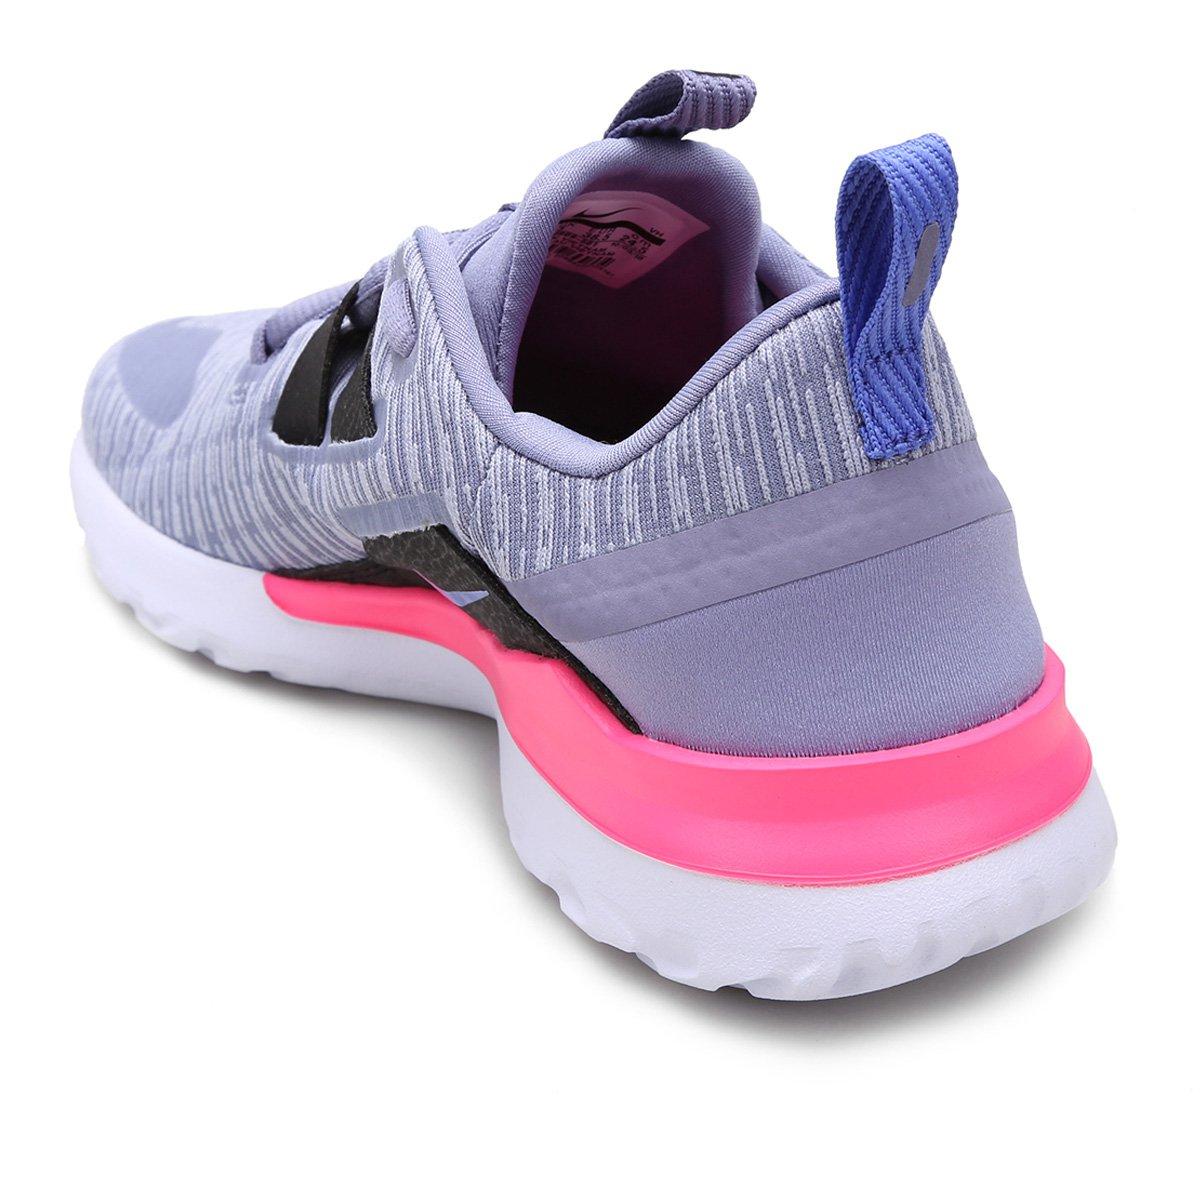 Tênis Nike Renew Arena Feminino Lilás Shop Timão